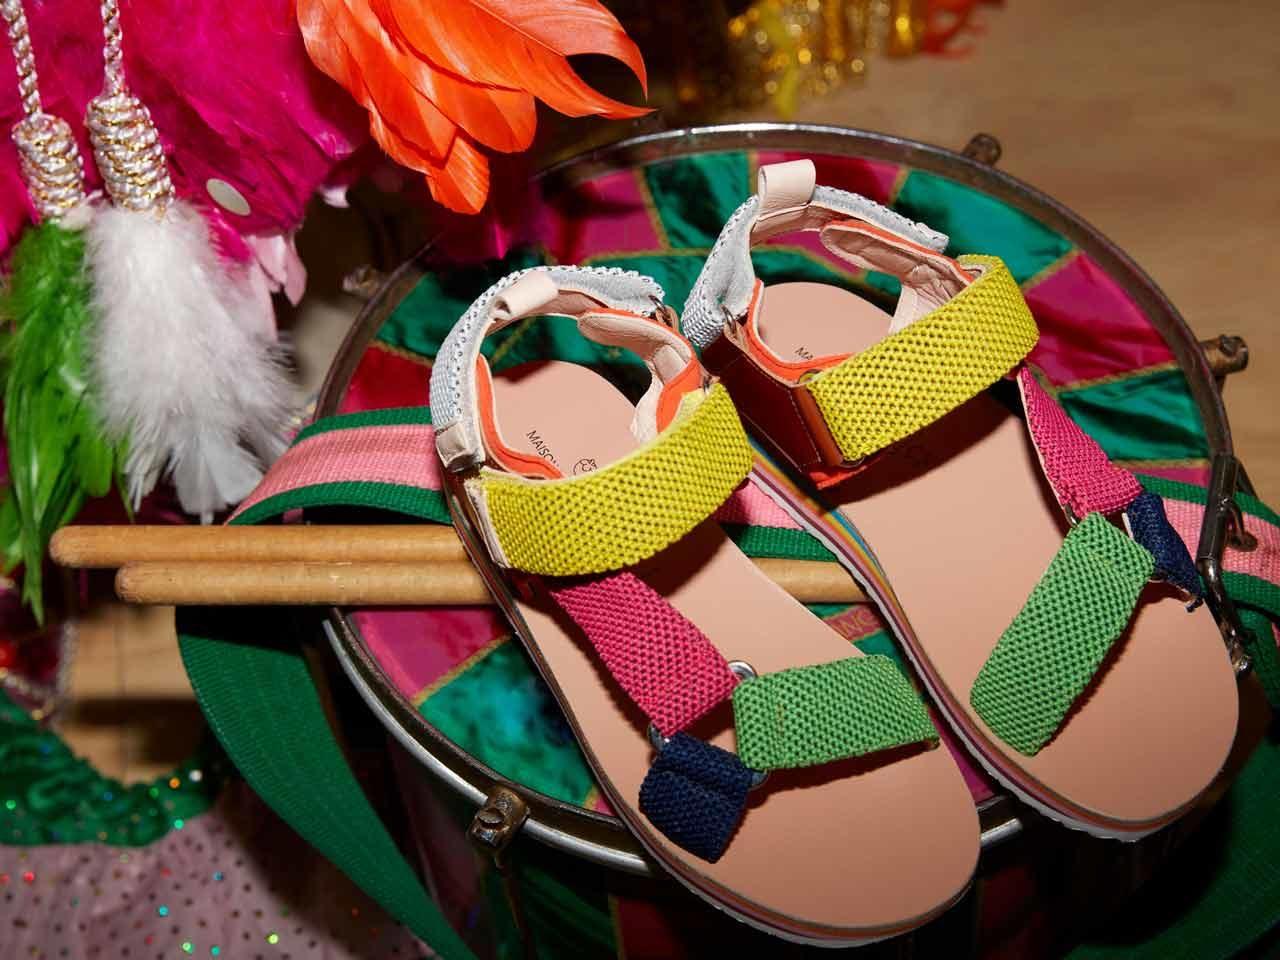 Sandales Jambo Maison Mangostan